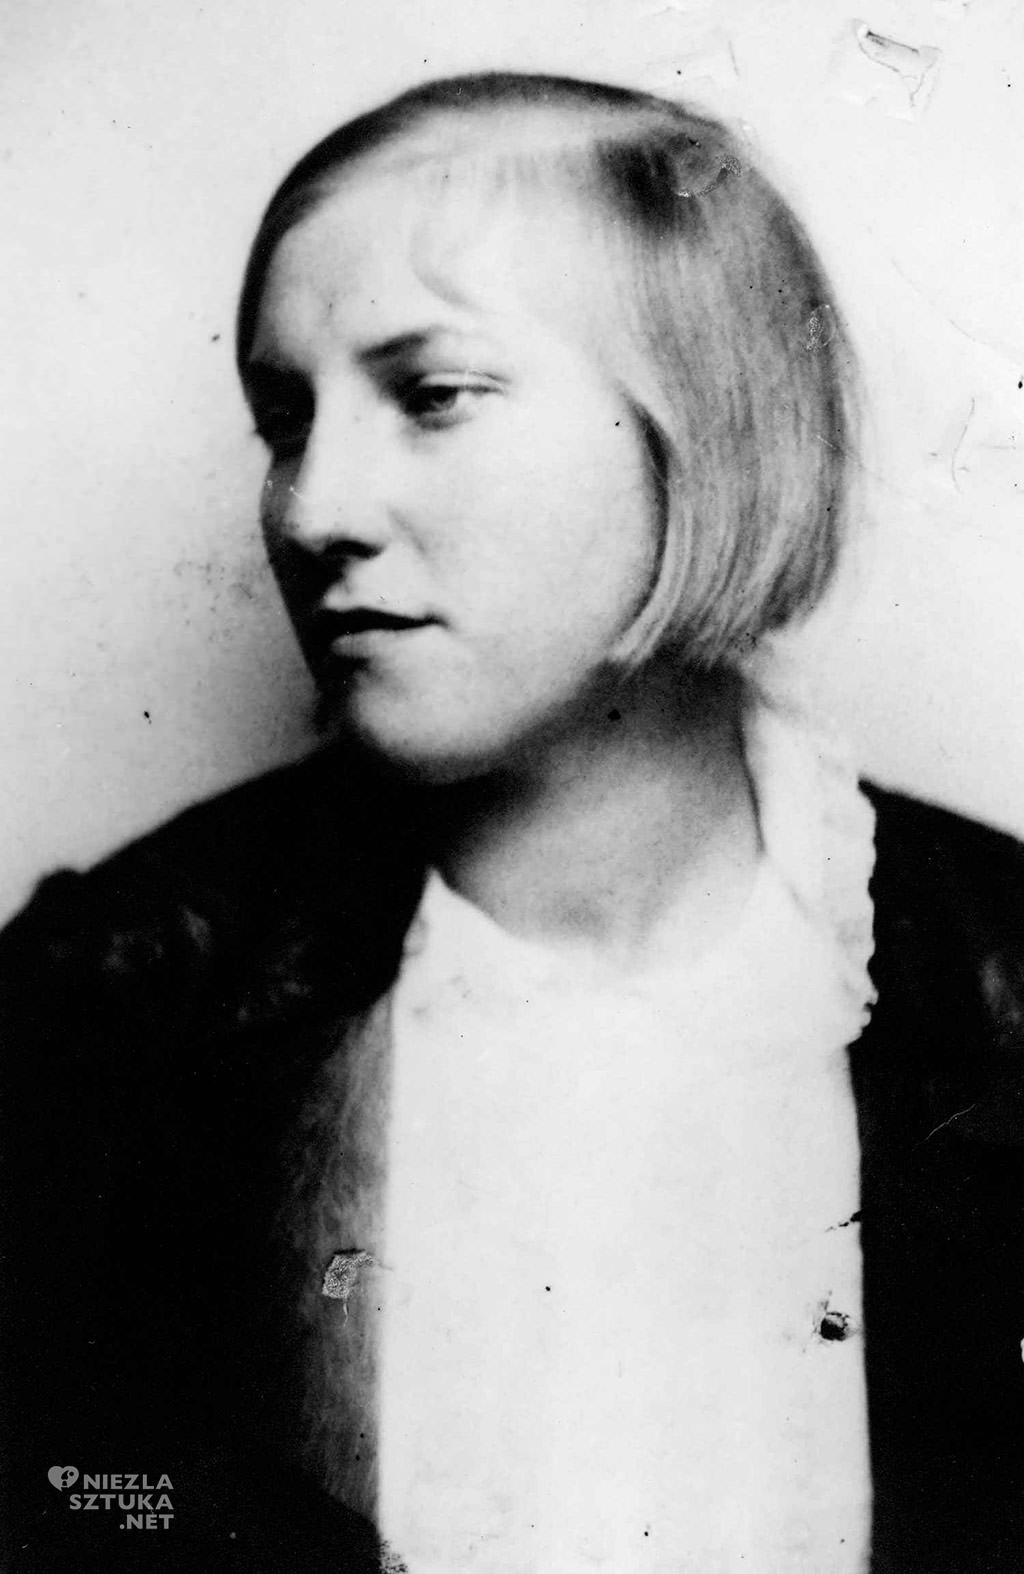 Marie-Therese-Walter, Pablo Picasso, Niezła sztuka